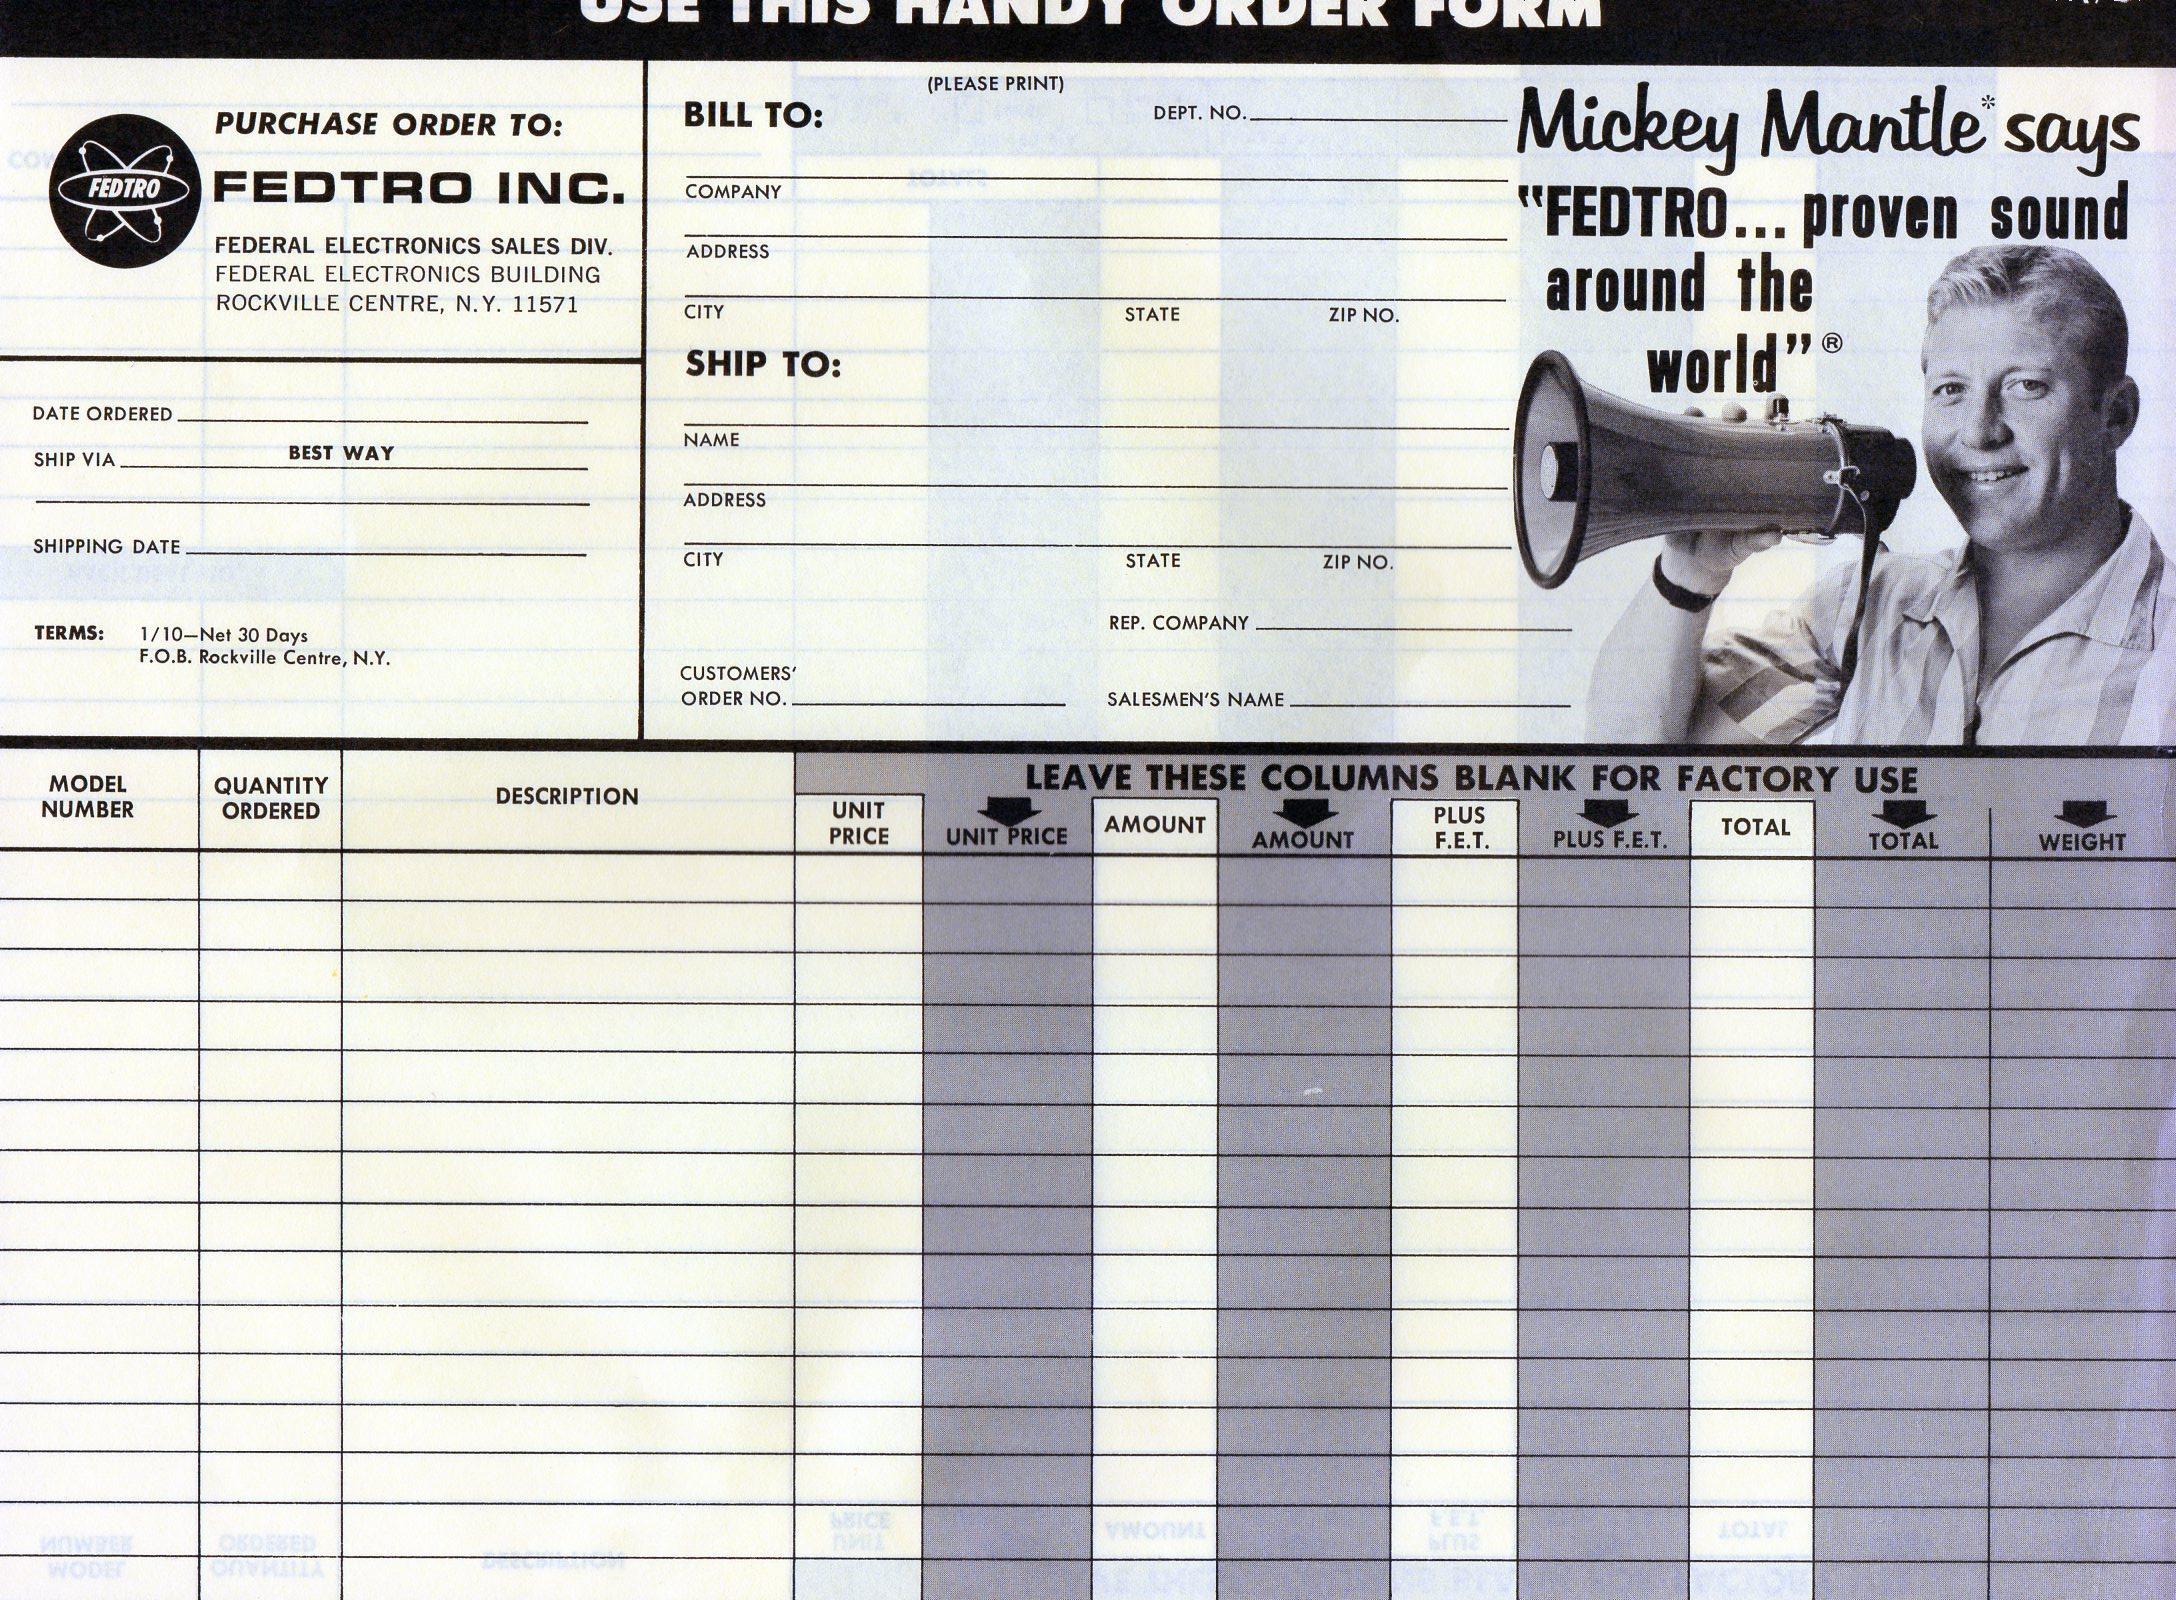 1960 era order form